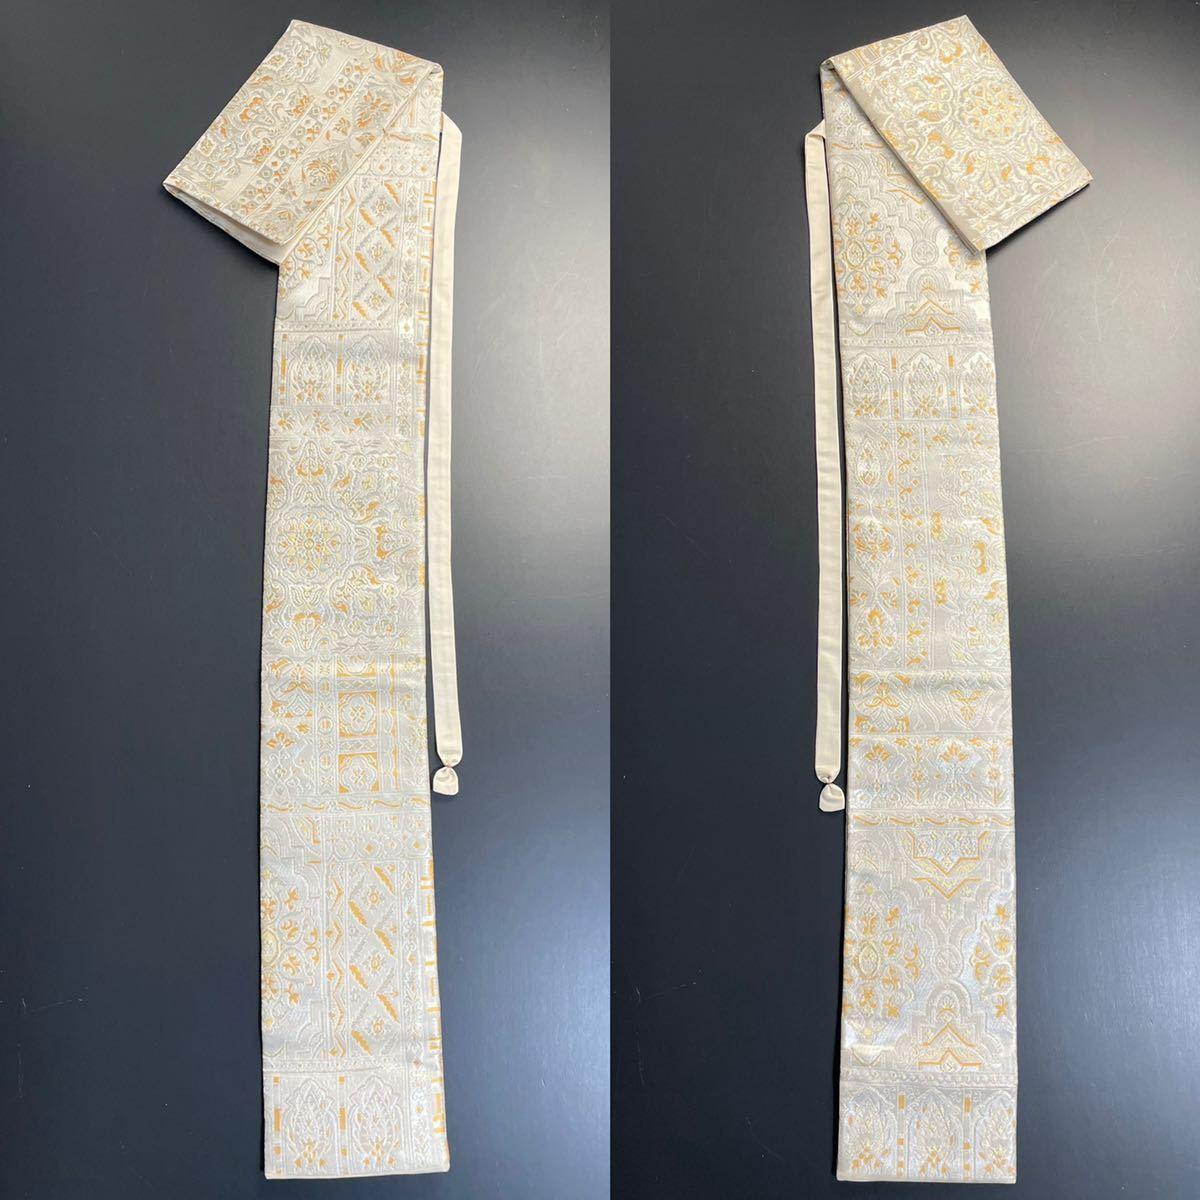 限定1本 日本刀 太刀 刀 刀袋 豪華 花紋 職人ハンドメイド 100% 正絹使用 一点物 8-5_画像10